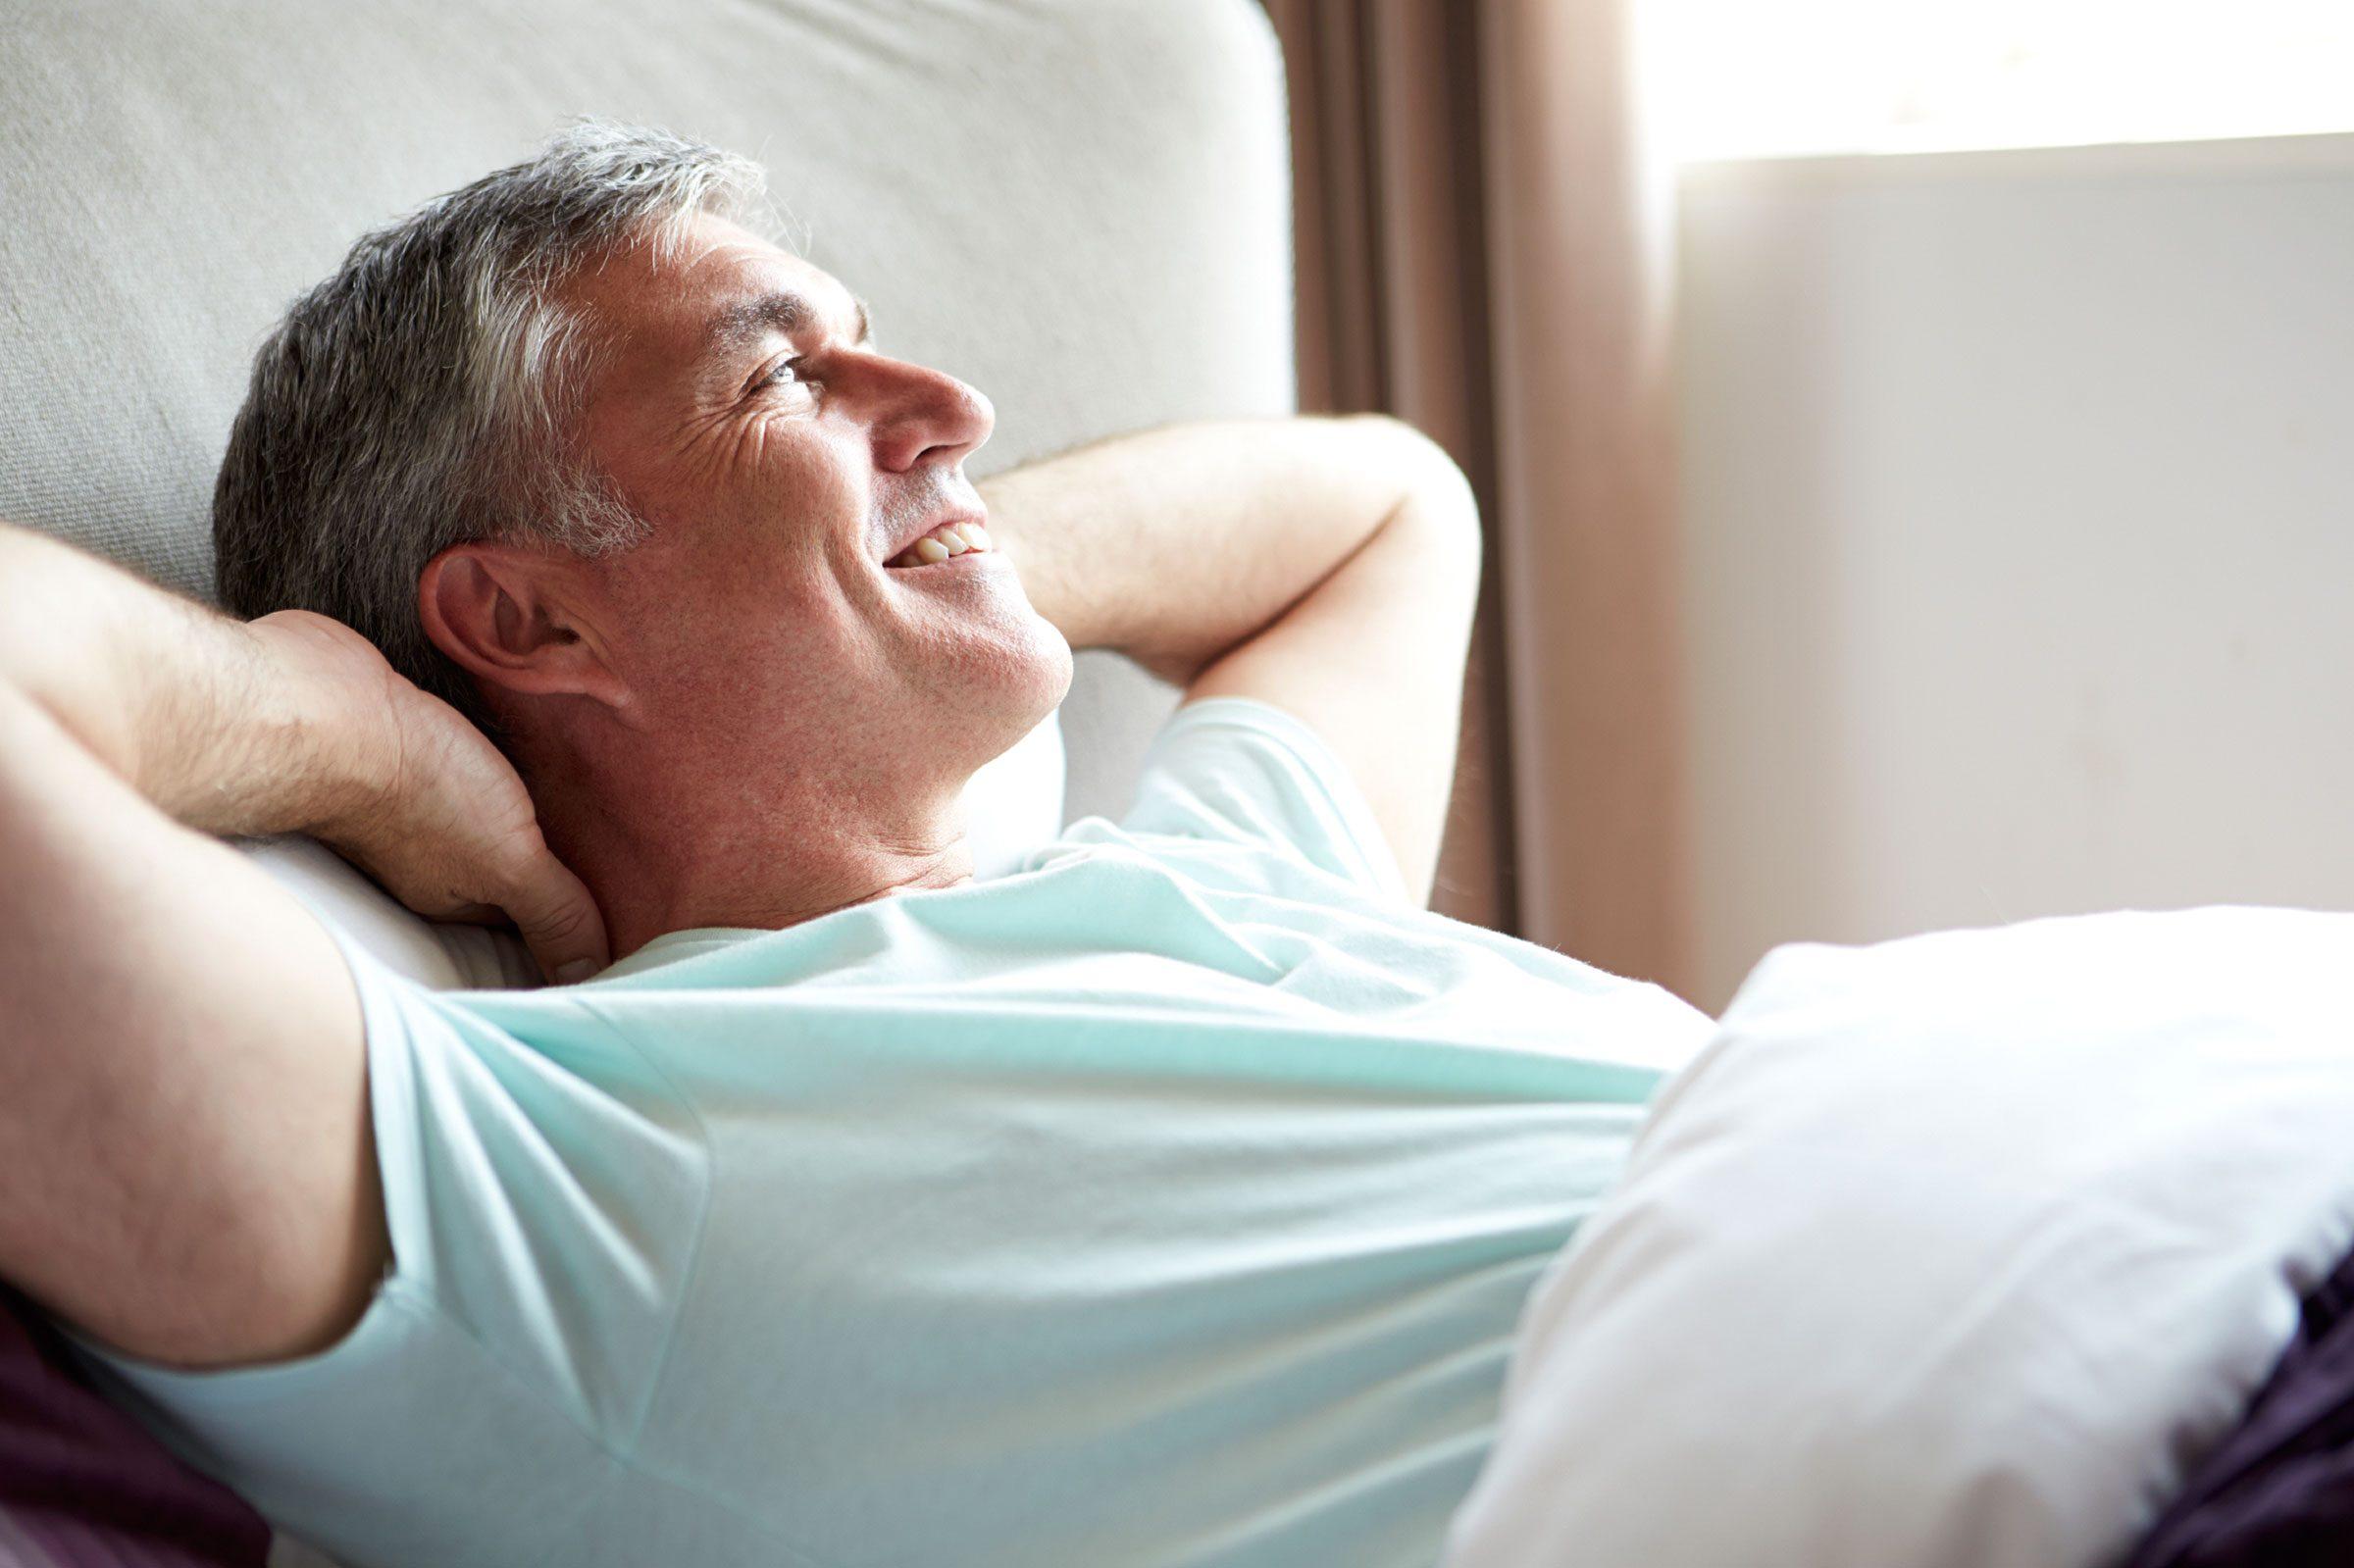 Myth: You need 8 hours of sleep a night